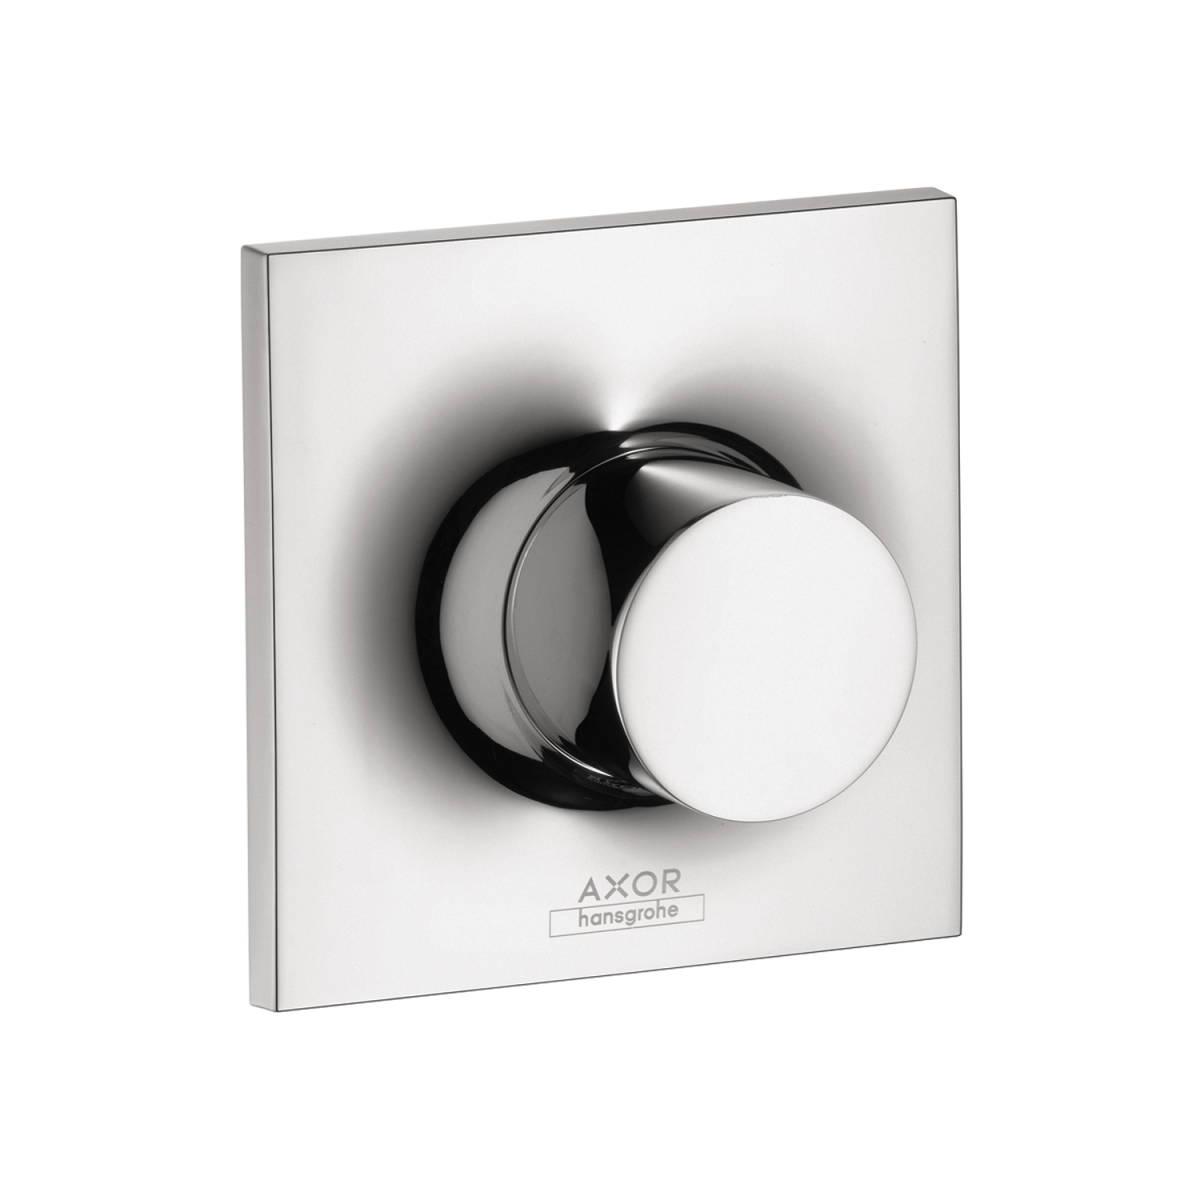 Shut-off valve for concealed installation, Chrome, 18974001